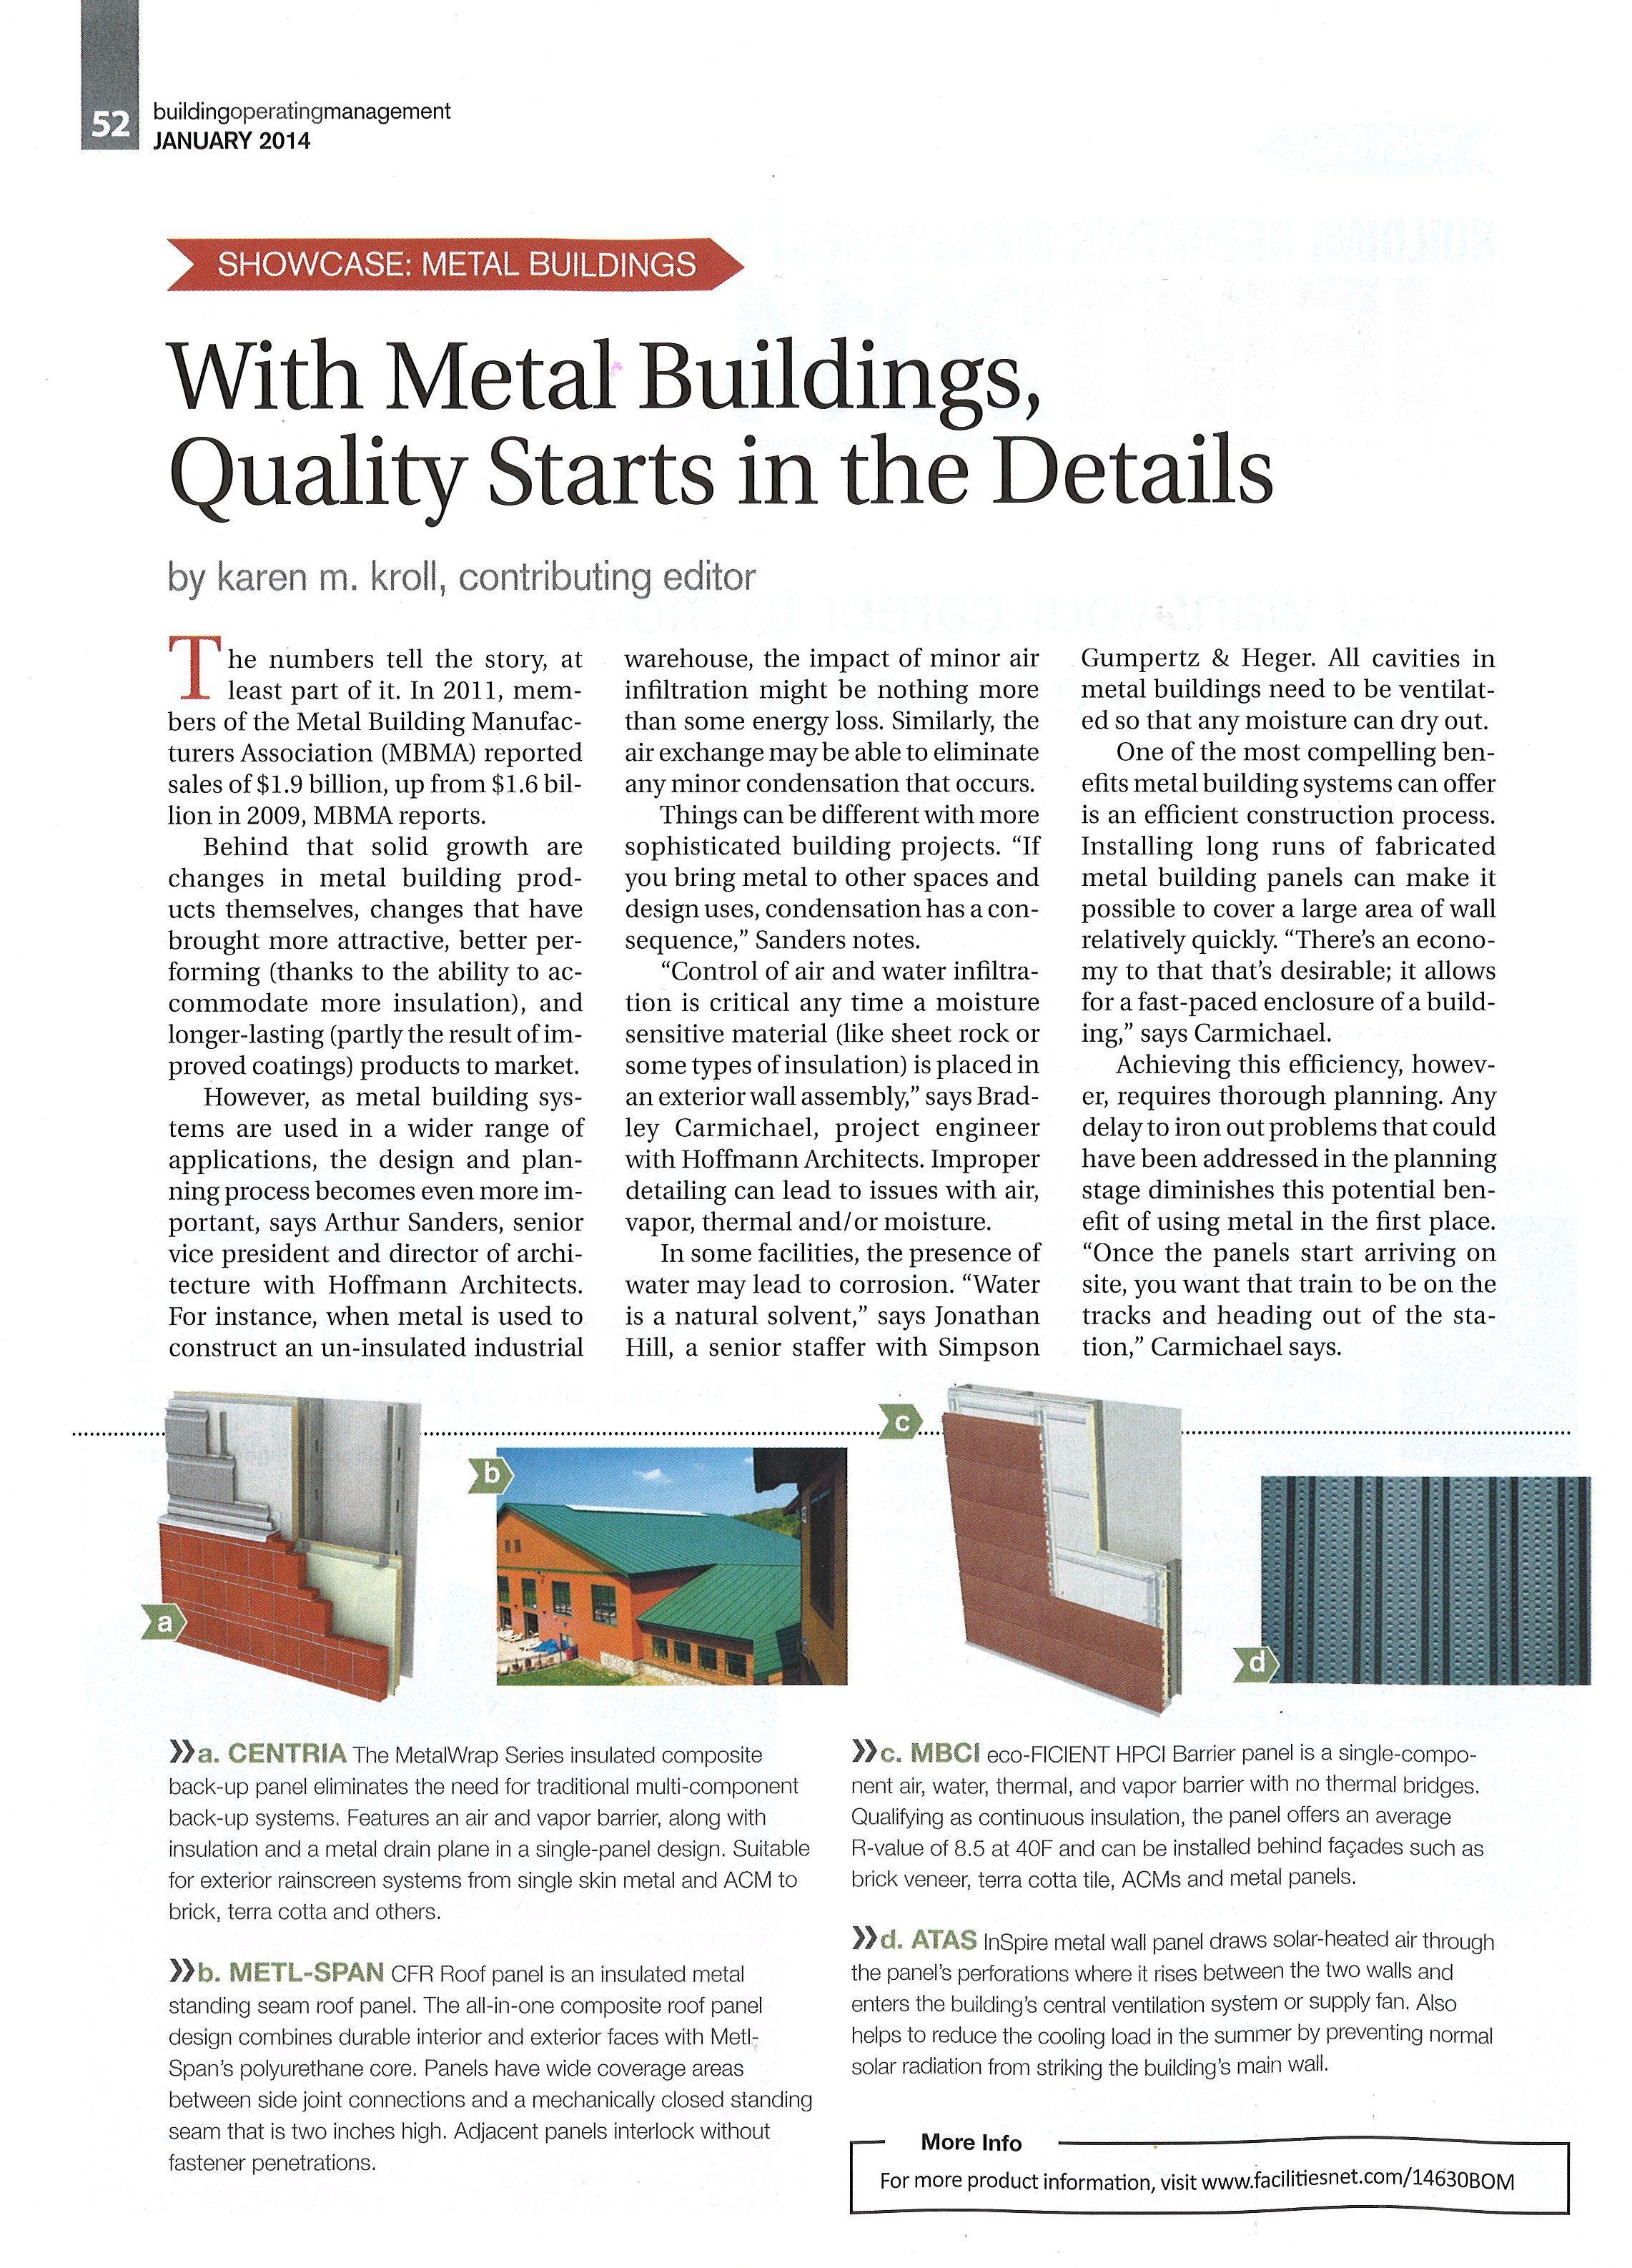 Showcase Metal Buildings Karen Kroll Interviews Art Sanders Aia And Brad Carmichael Pe Building Operating Man Metal Buildings Building Systems Building